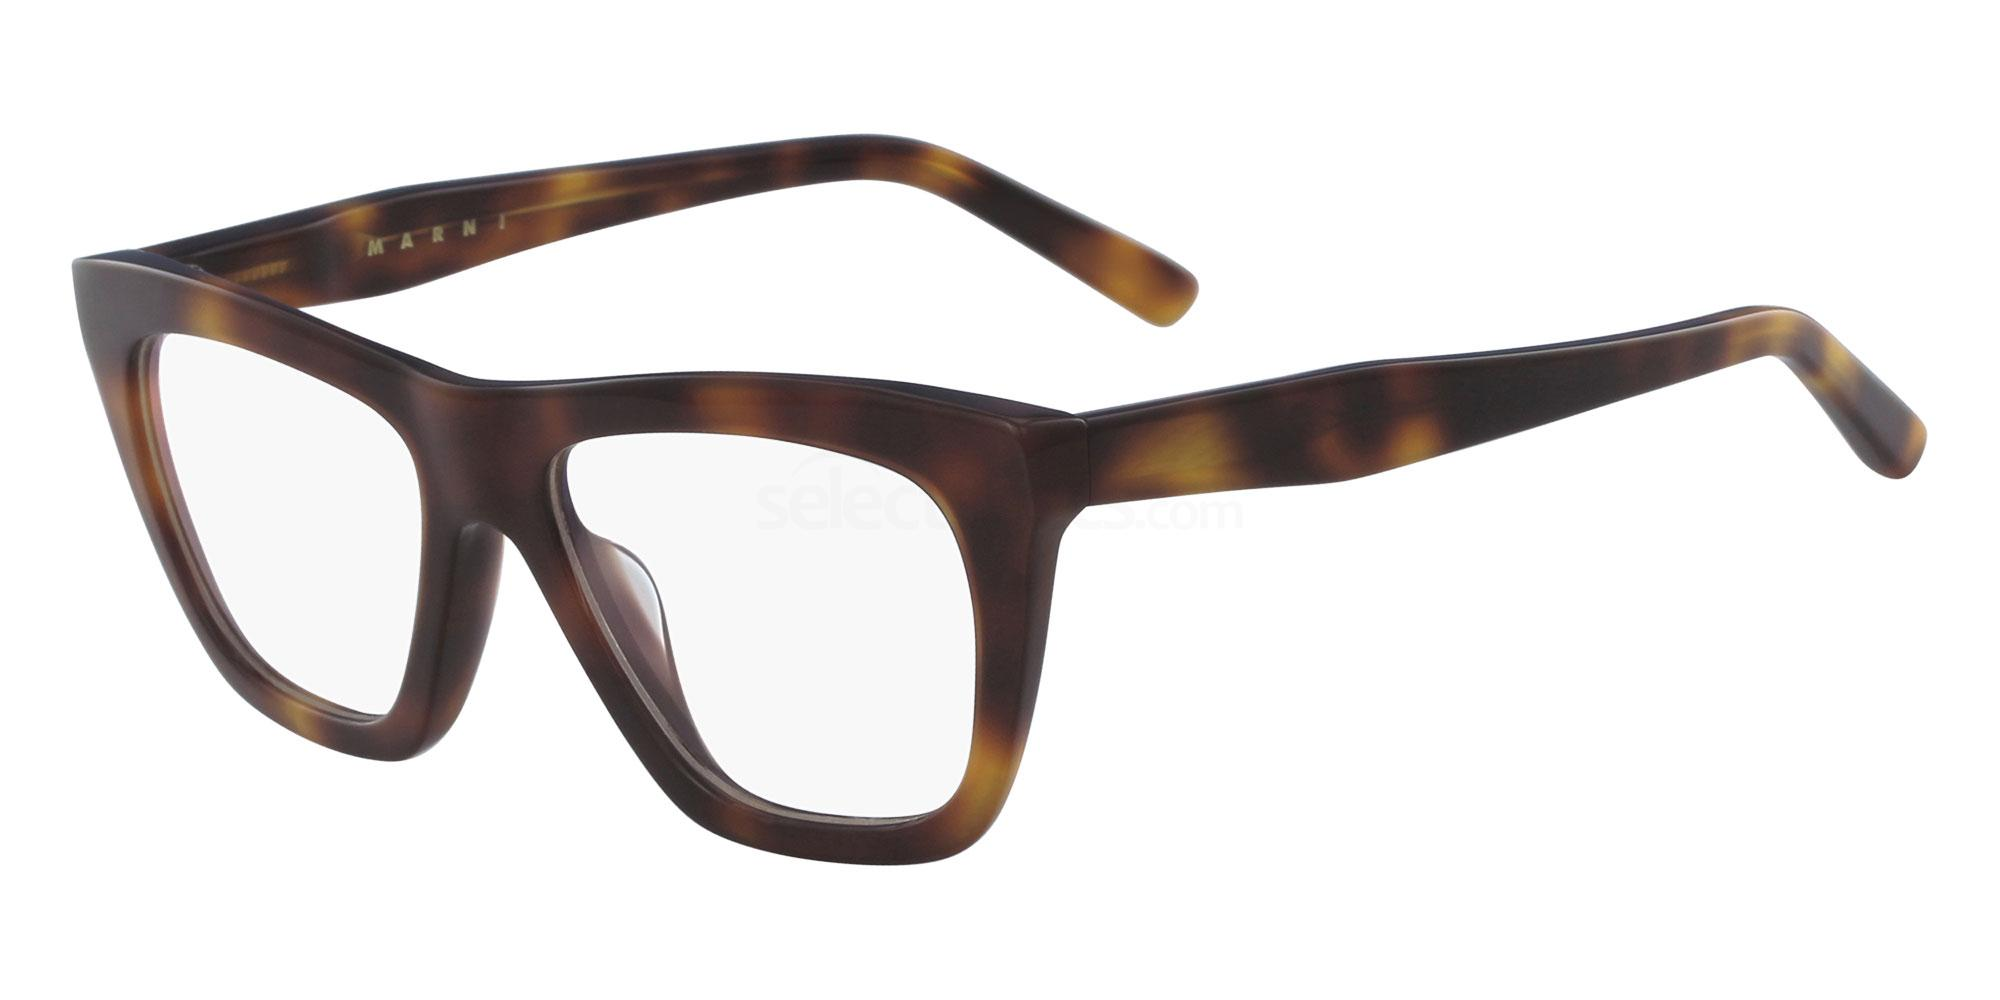 218 ME2619 Glasses, Marni